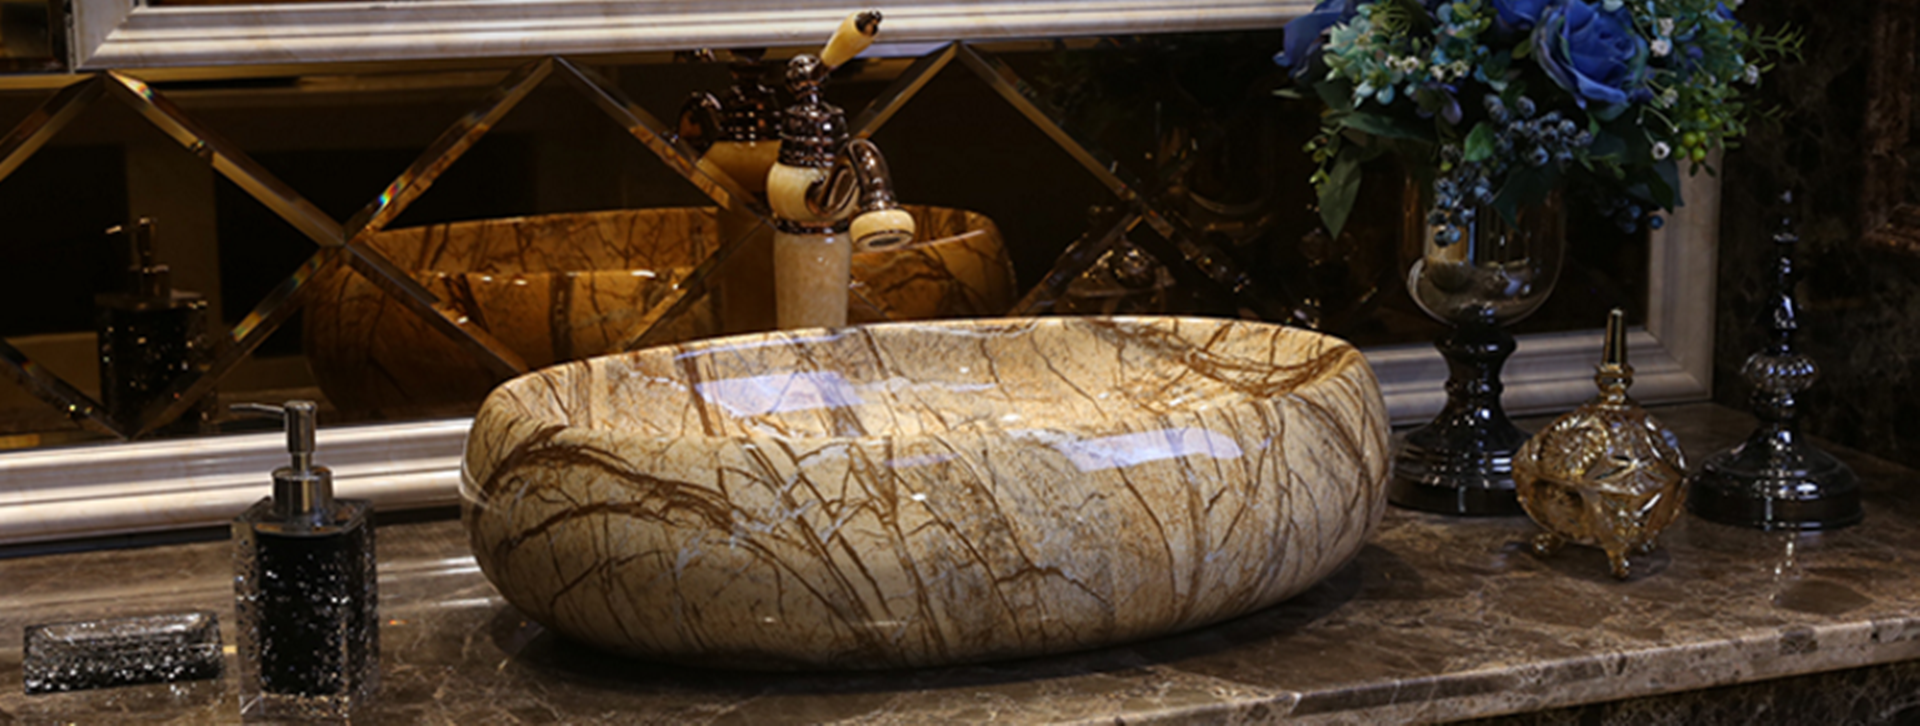 China art ceramic sinks Store - Small Orders Online Store, Hot ...